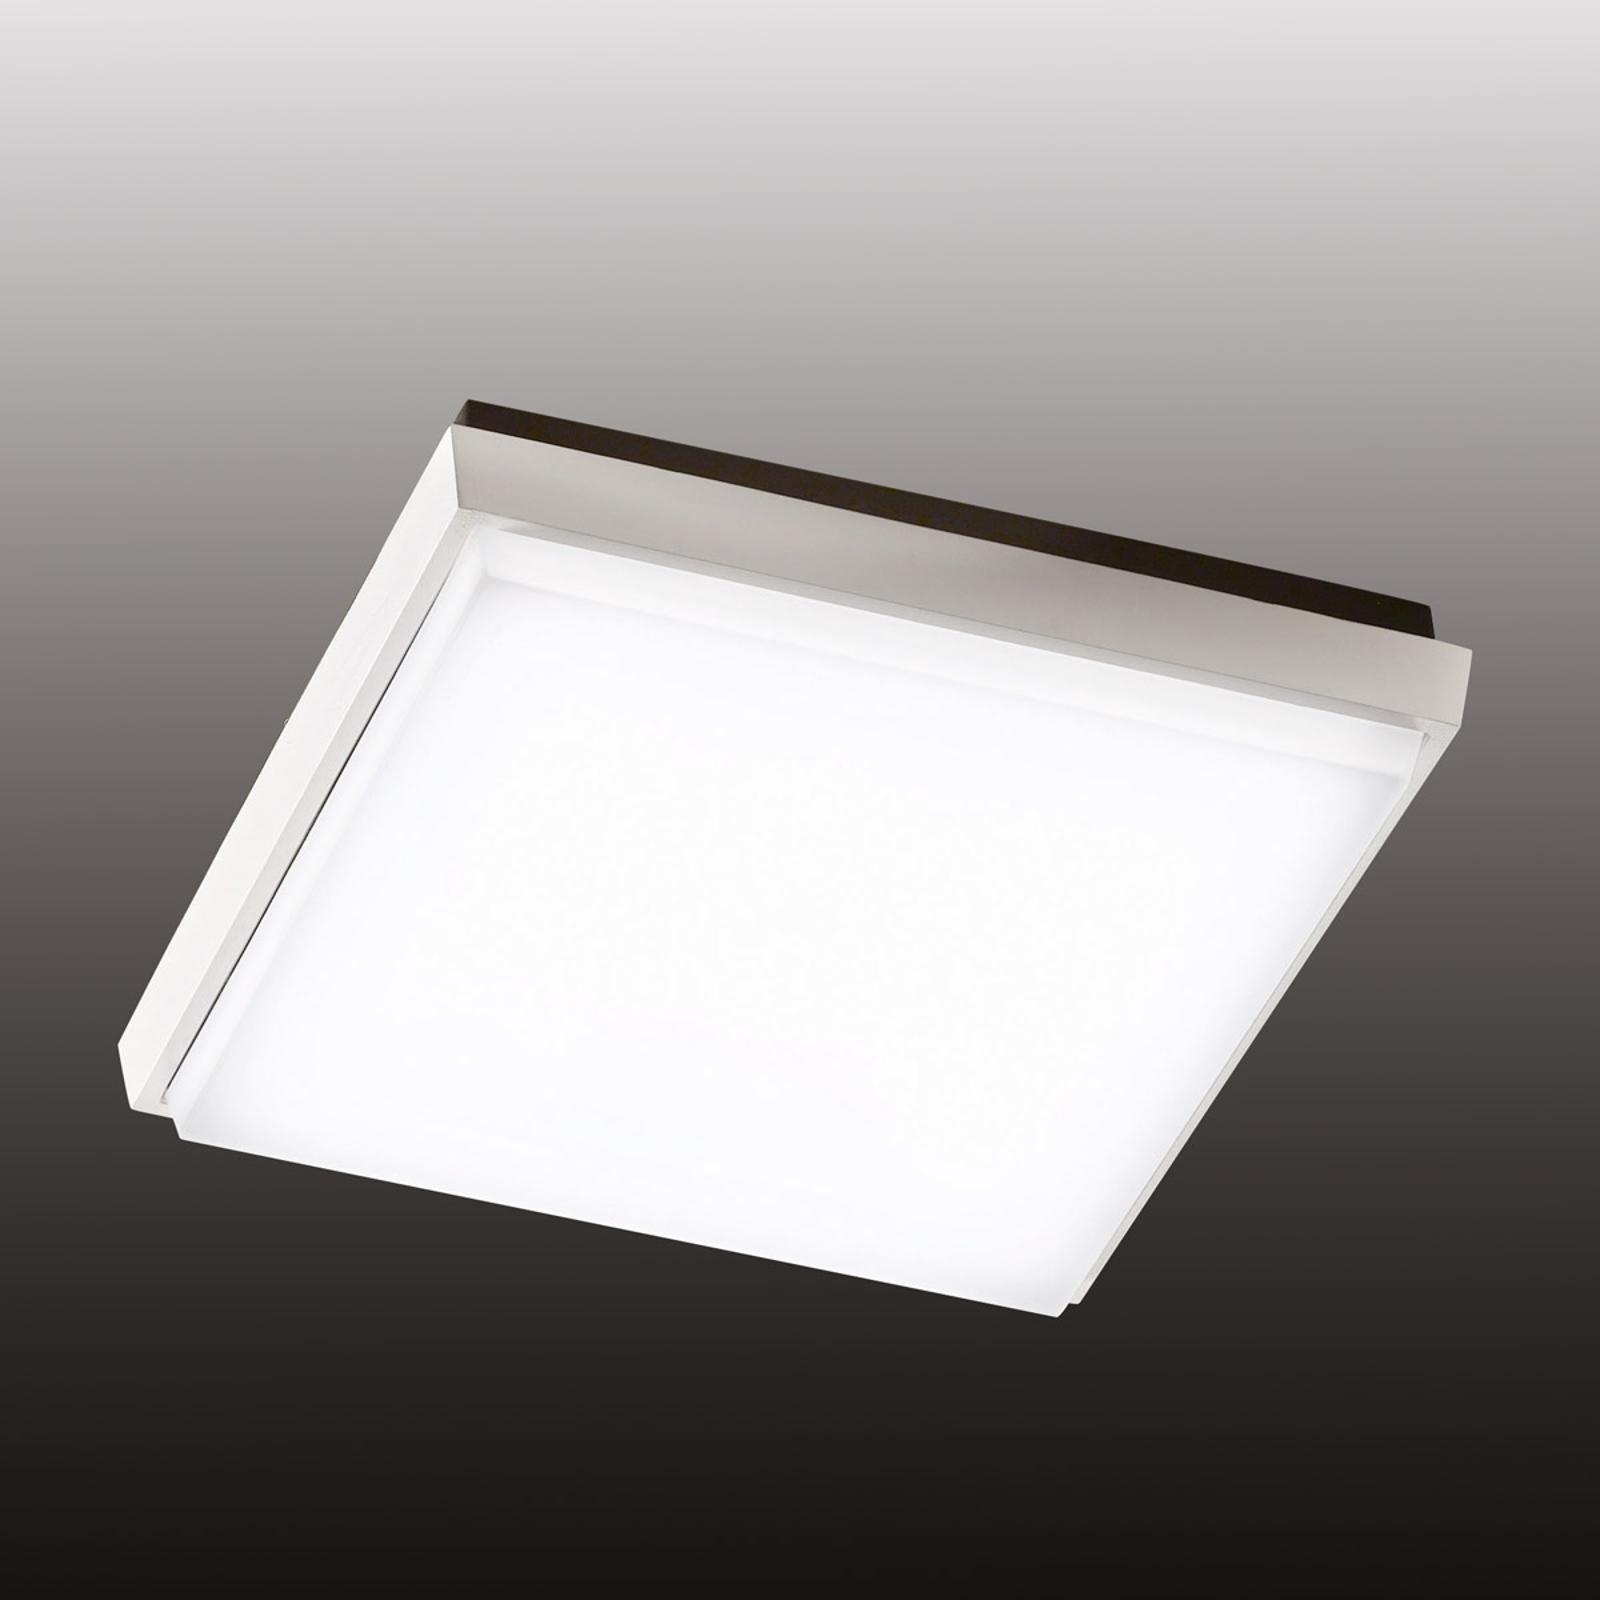 Vierkante LED outdoor plafondlamp Desdy